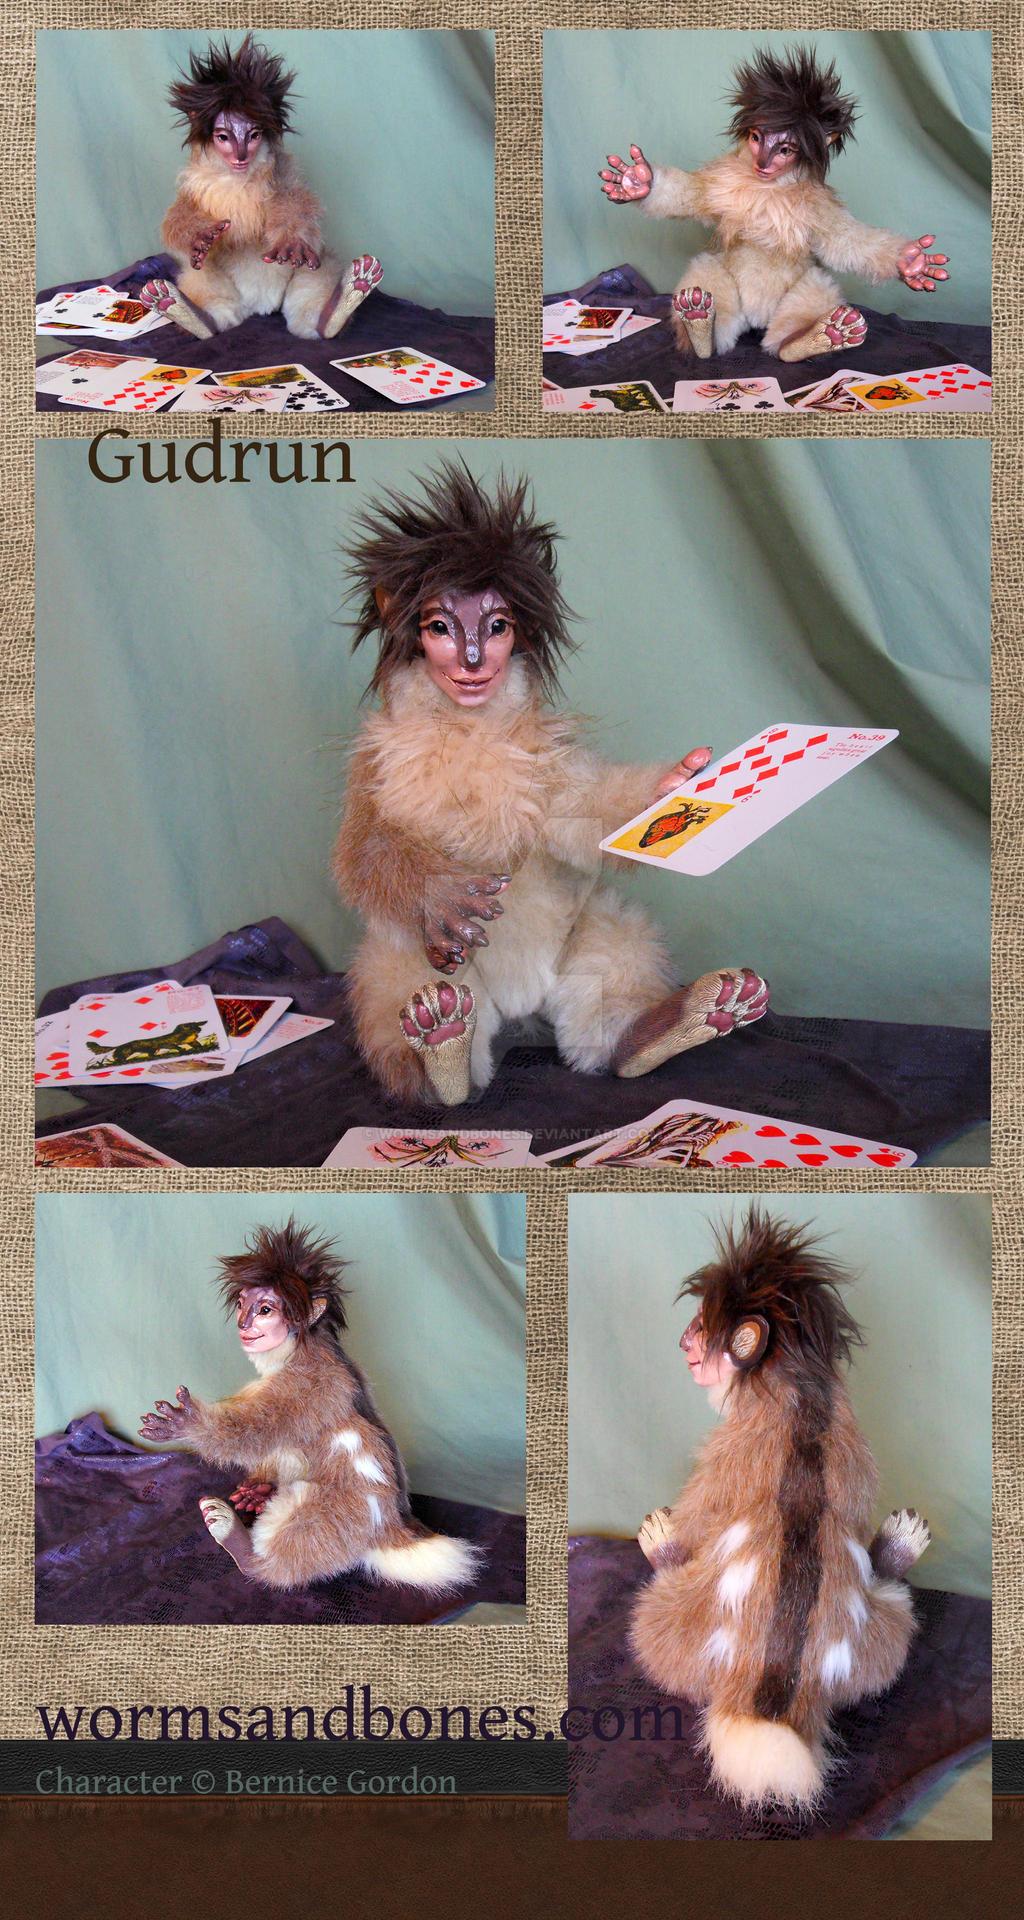 Commission: Gudrun